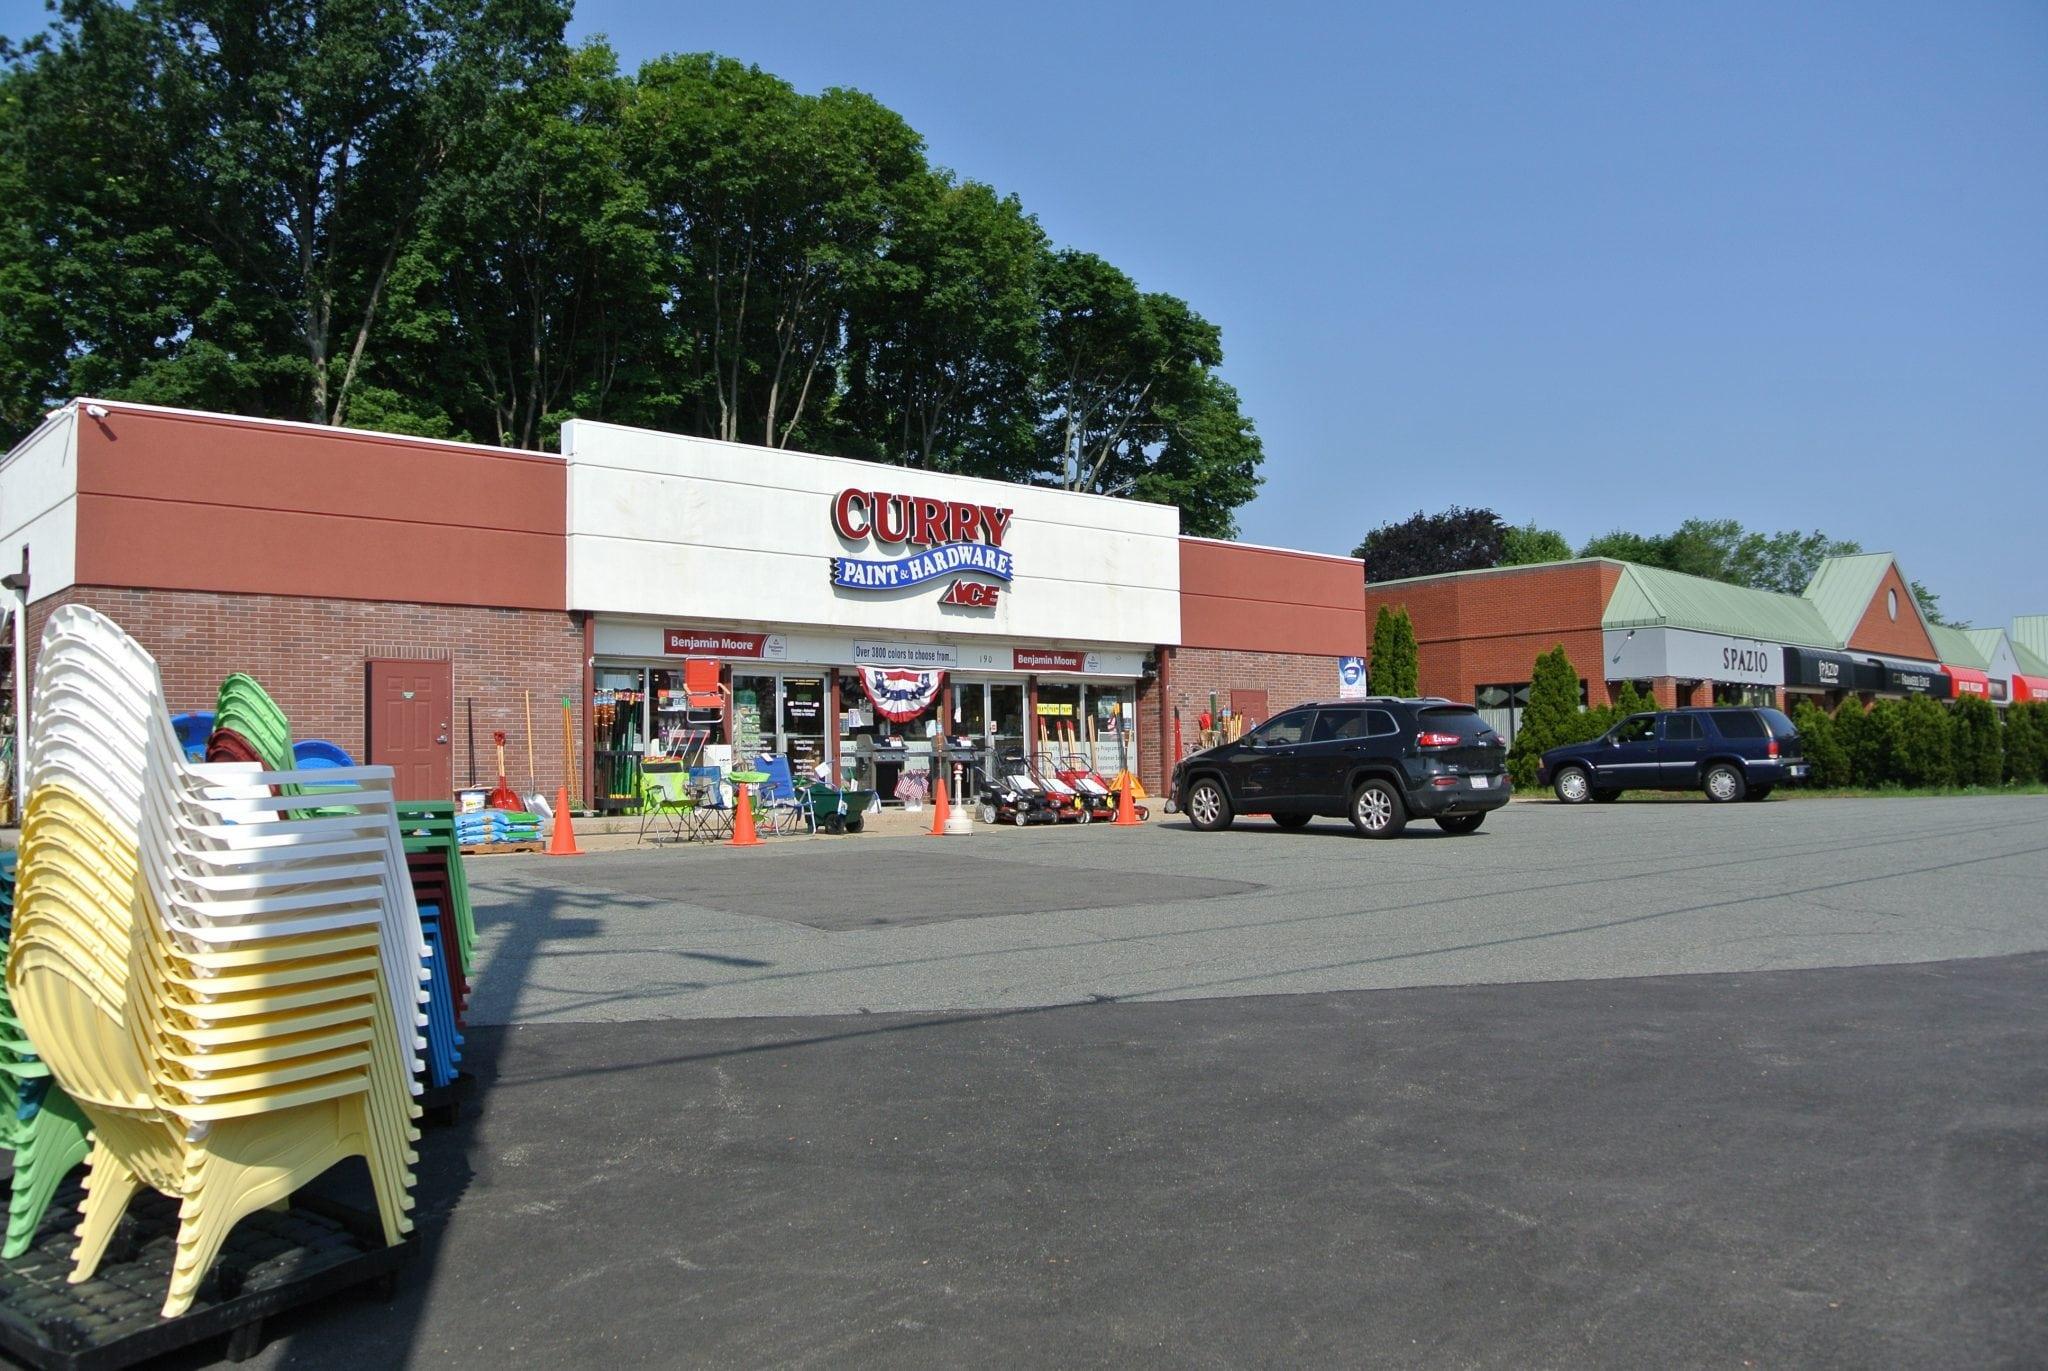 Braintree Store